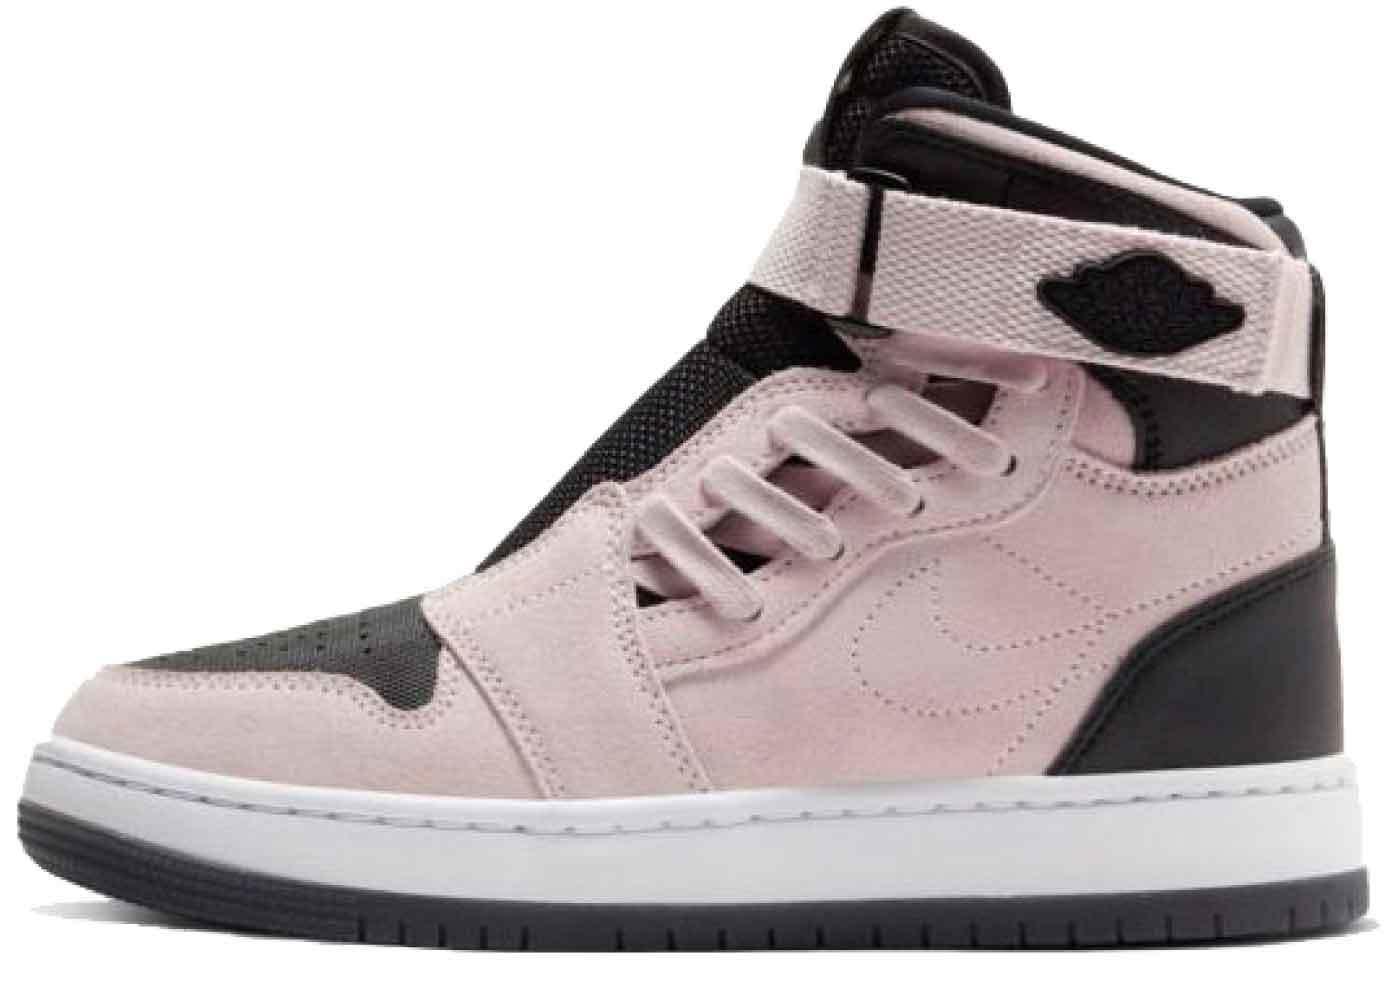 Nike Air Jordan 1 Nova XX Barely Rose Womensの写真